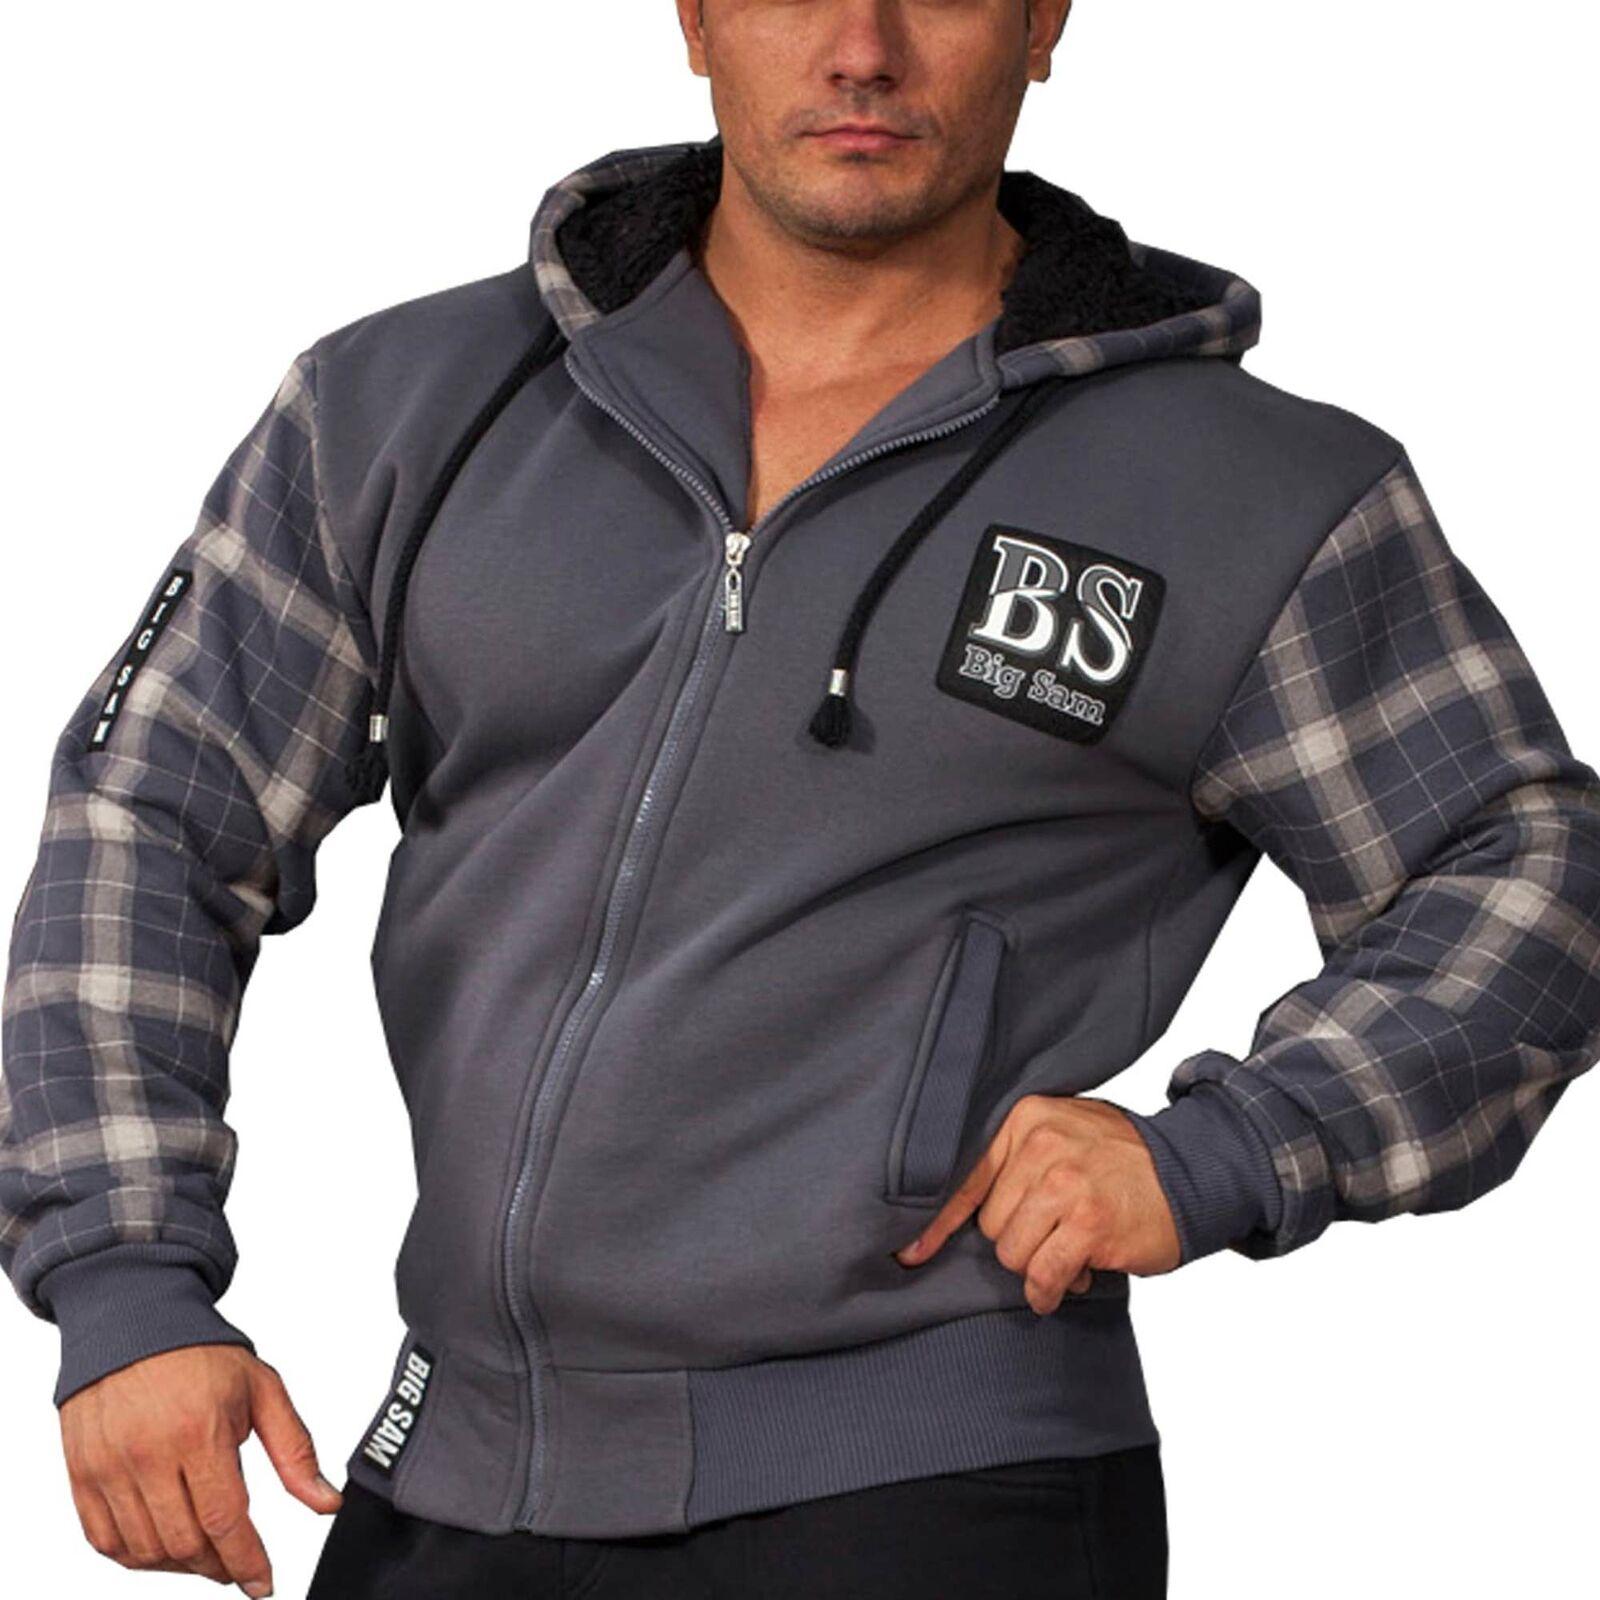 BIG SM EXTREME SPORTSWEAR Bodybuilding Sweatshirt jacket Hoody 3588